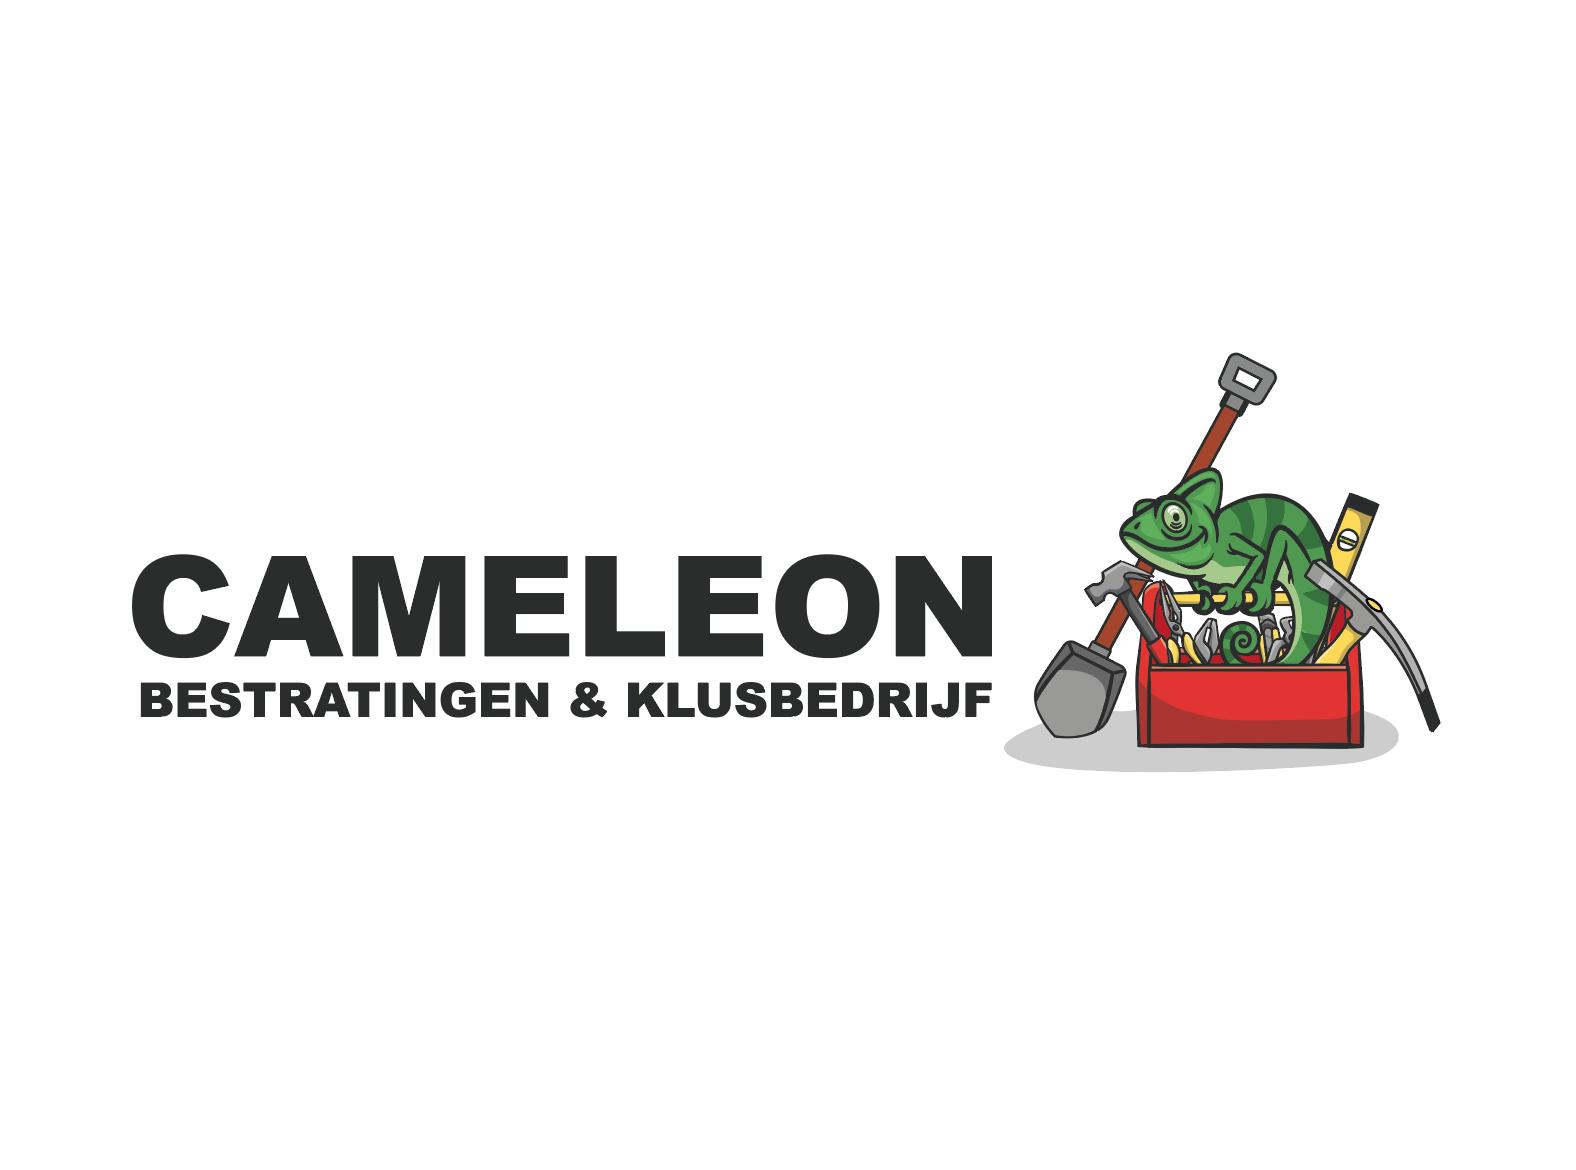 CAMELEON BESTRATINGEN